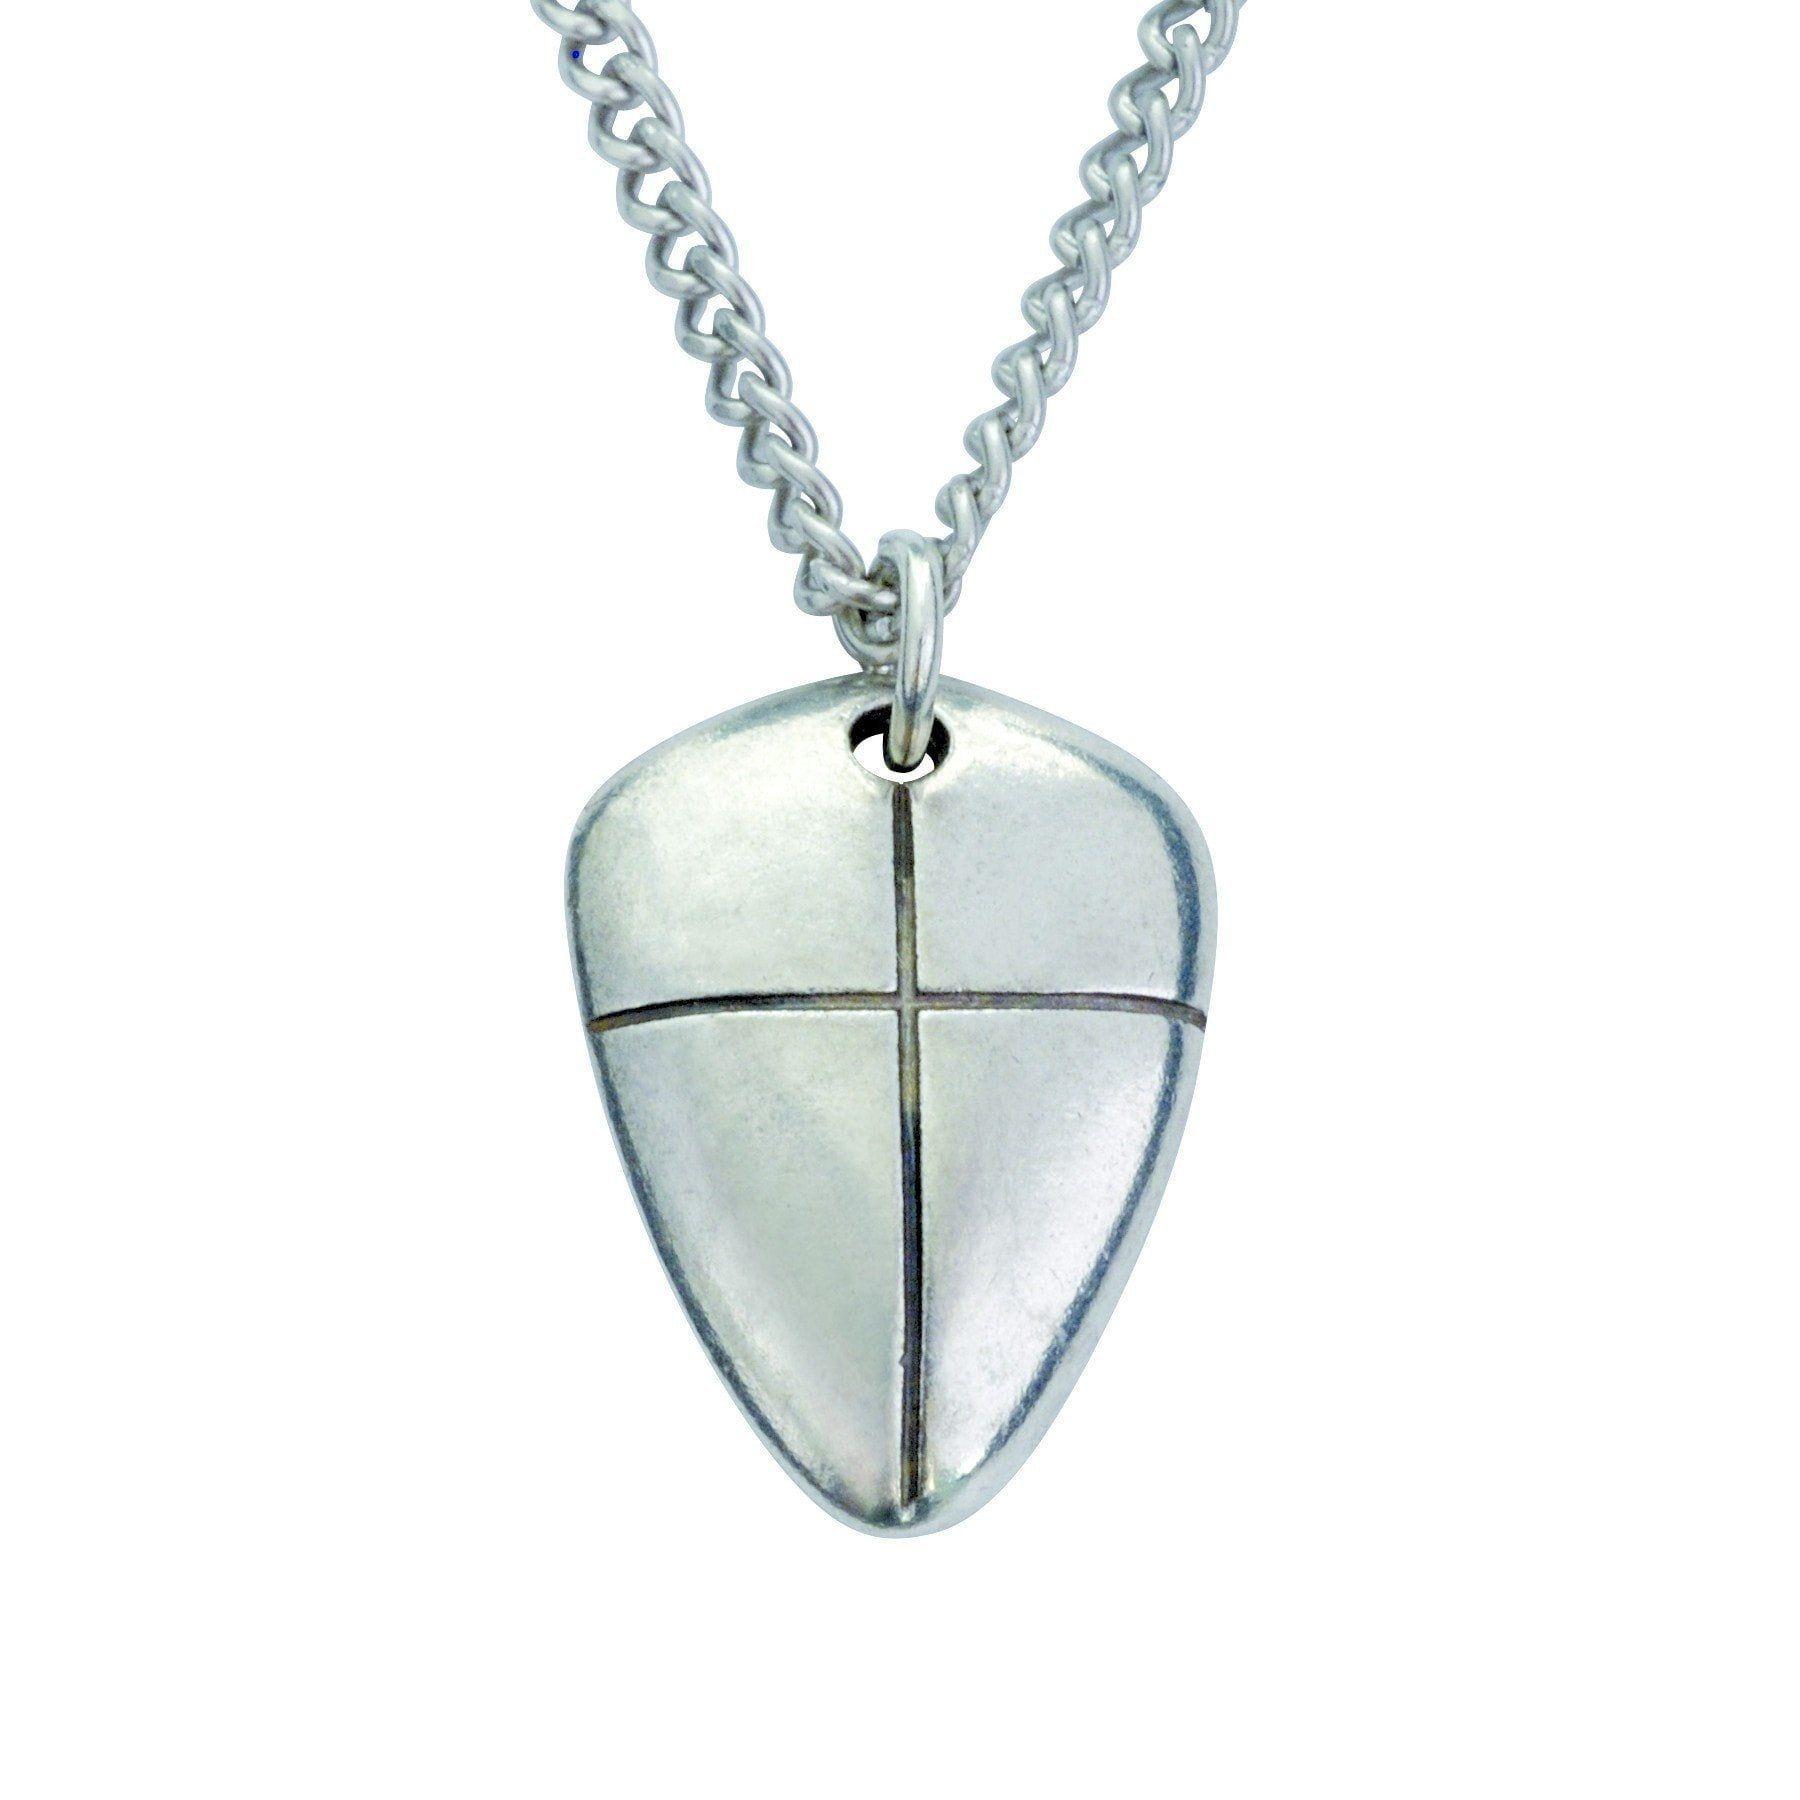 Christian necklace small shield of faith wcross christian aloadofball Images